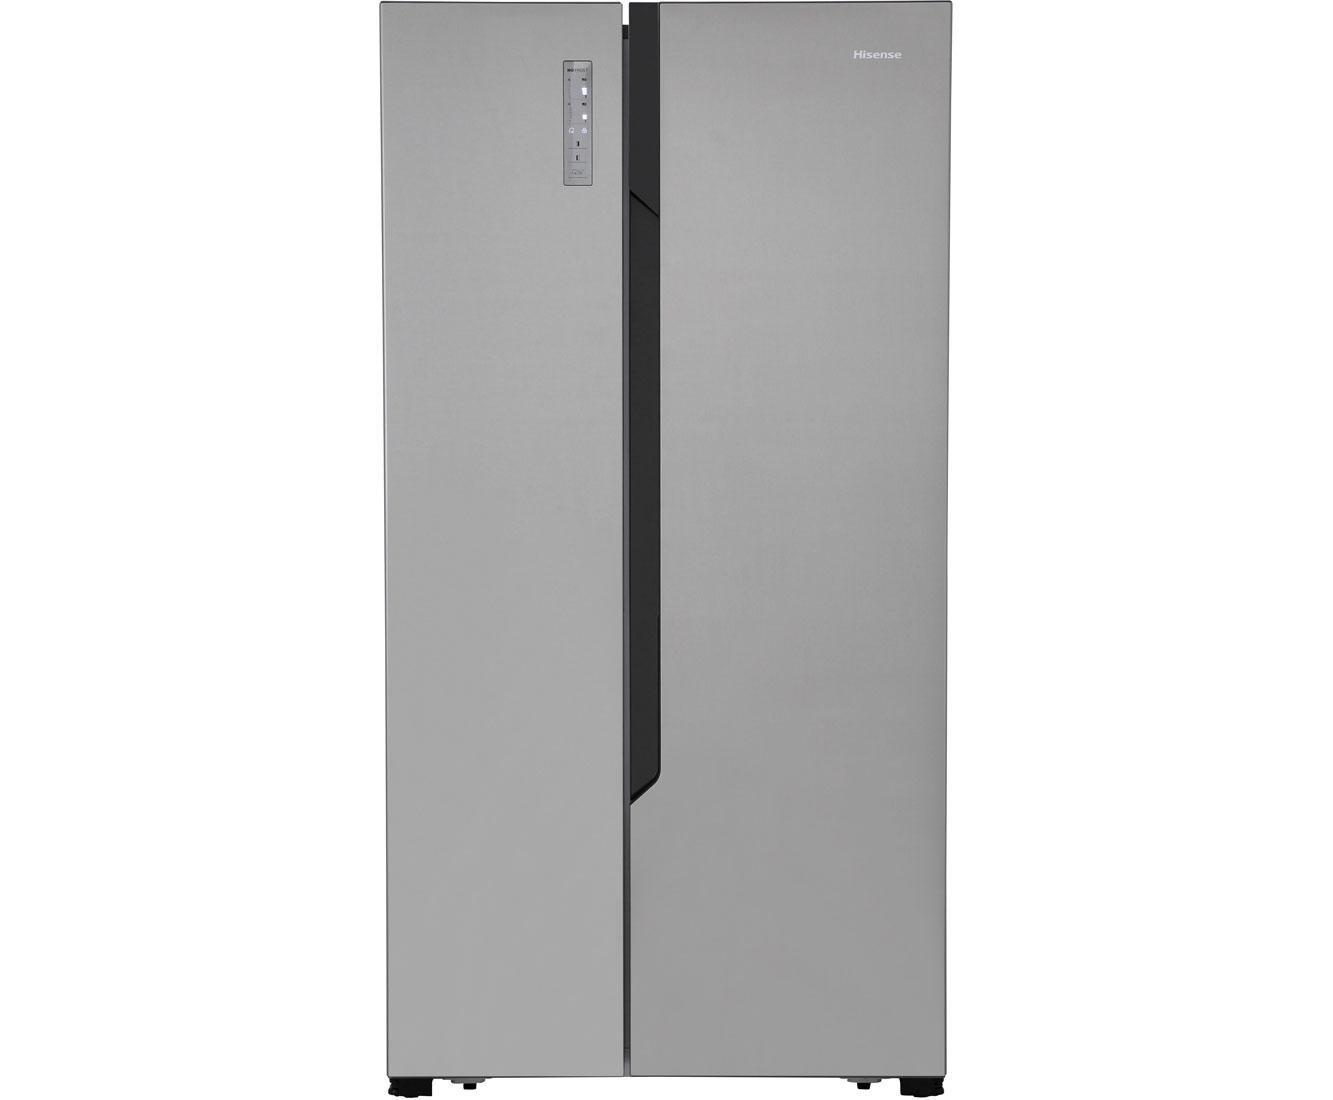 Side By Side Kühlschrank Höhe 200 Cm : Side by side kühlschrank preisvergleich u die besten angebote